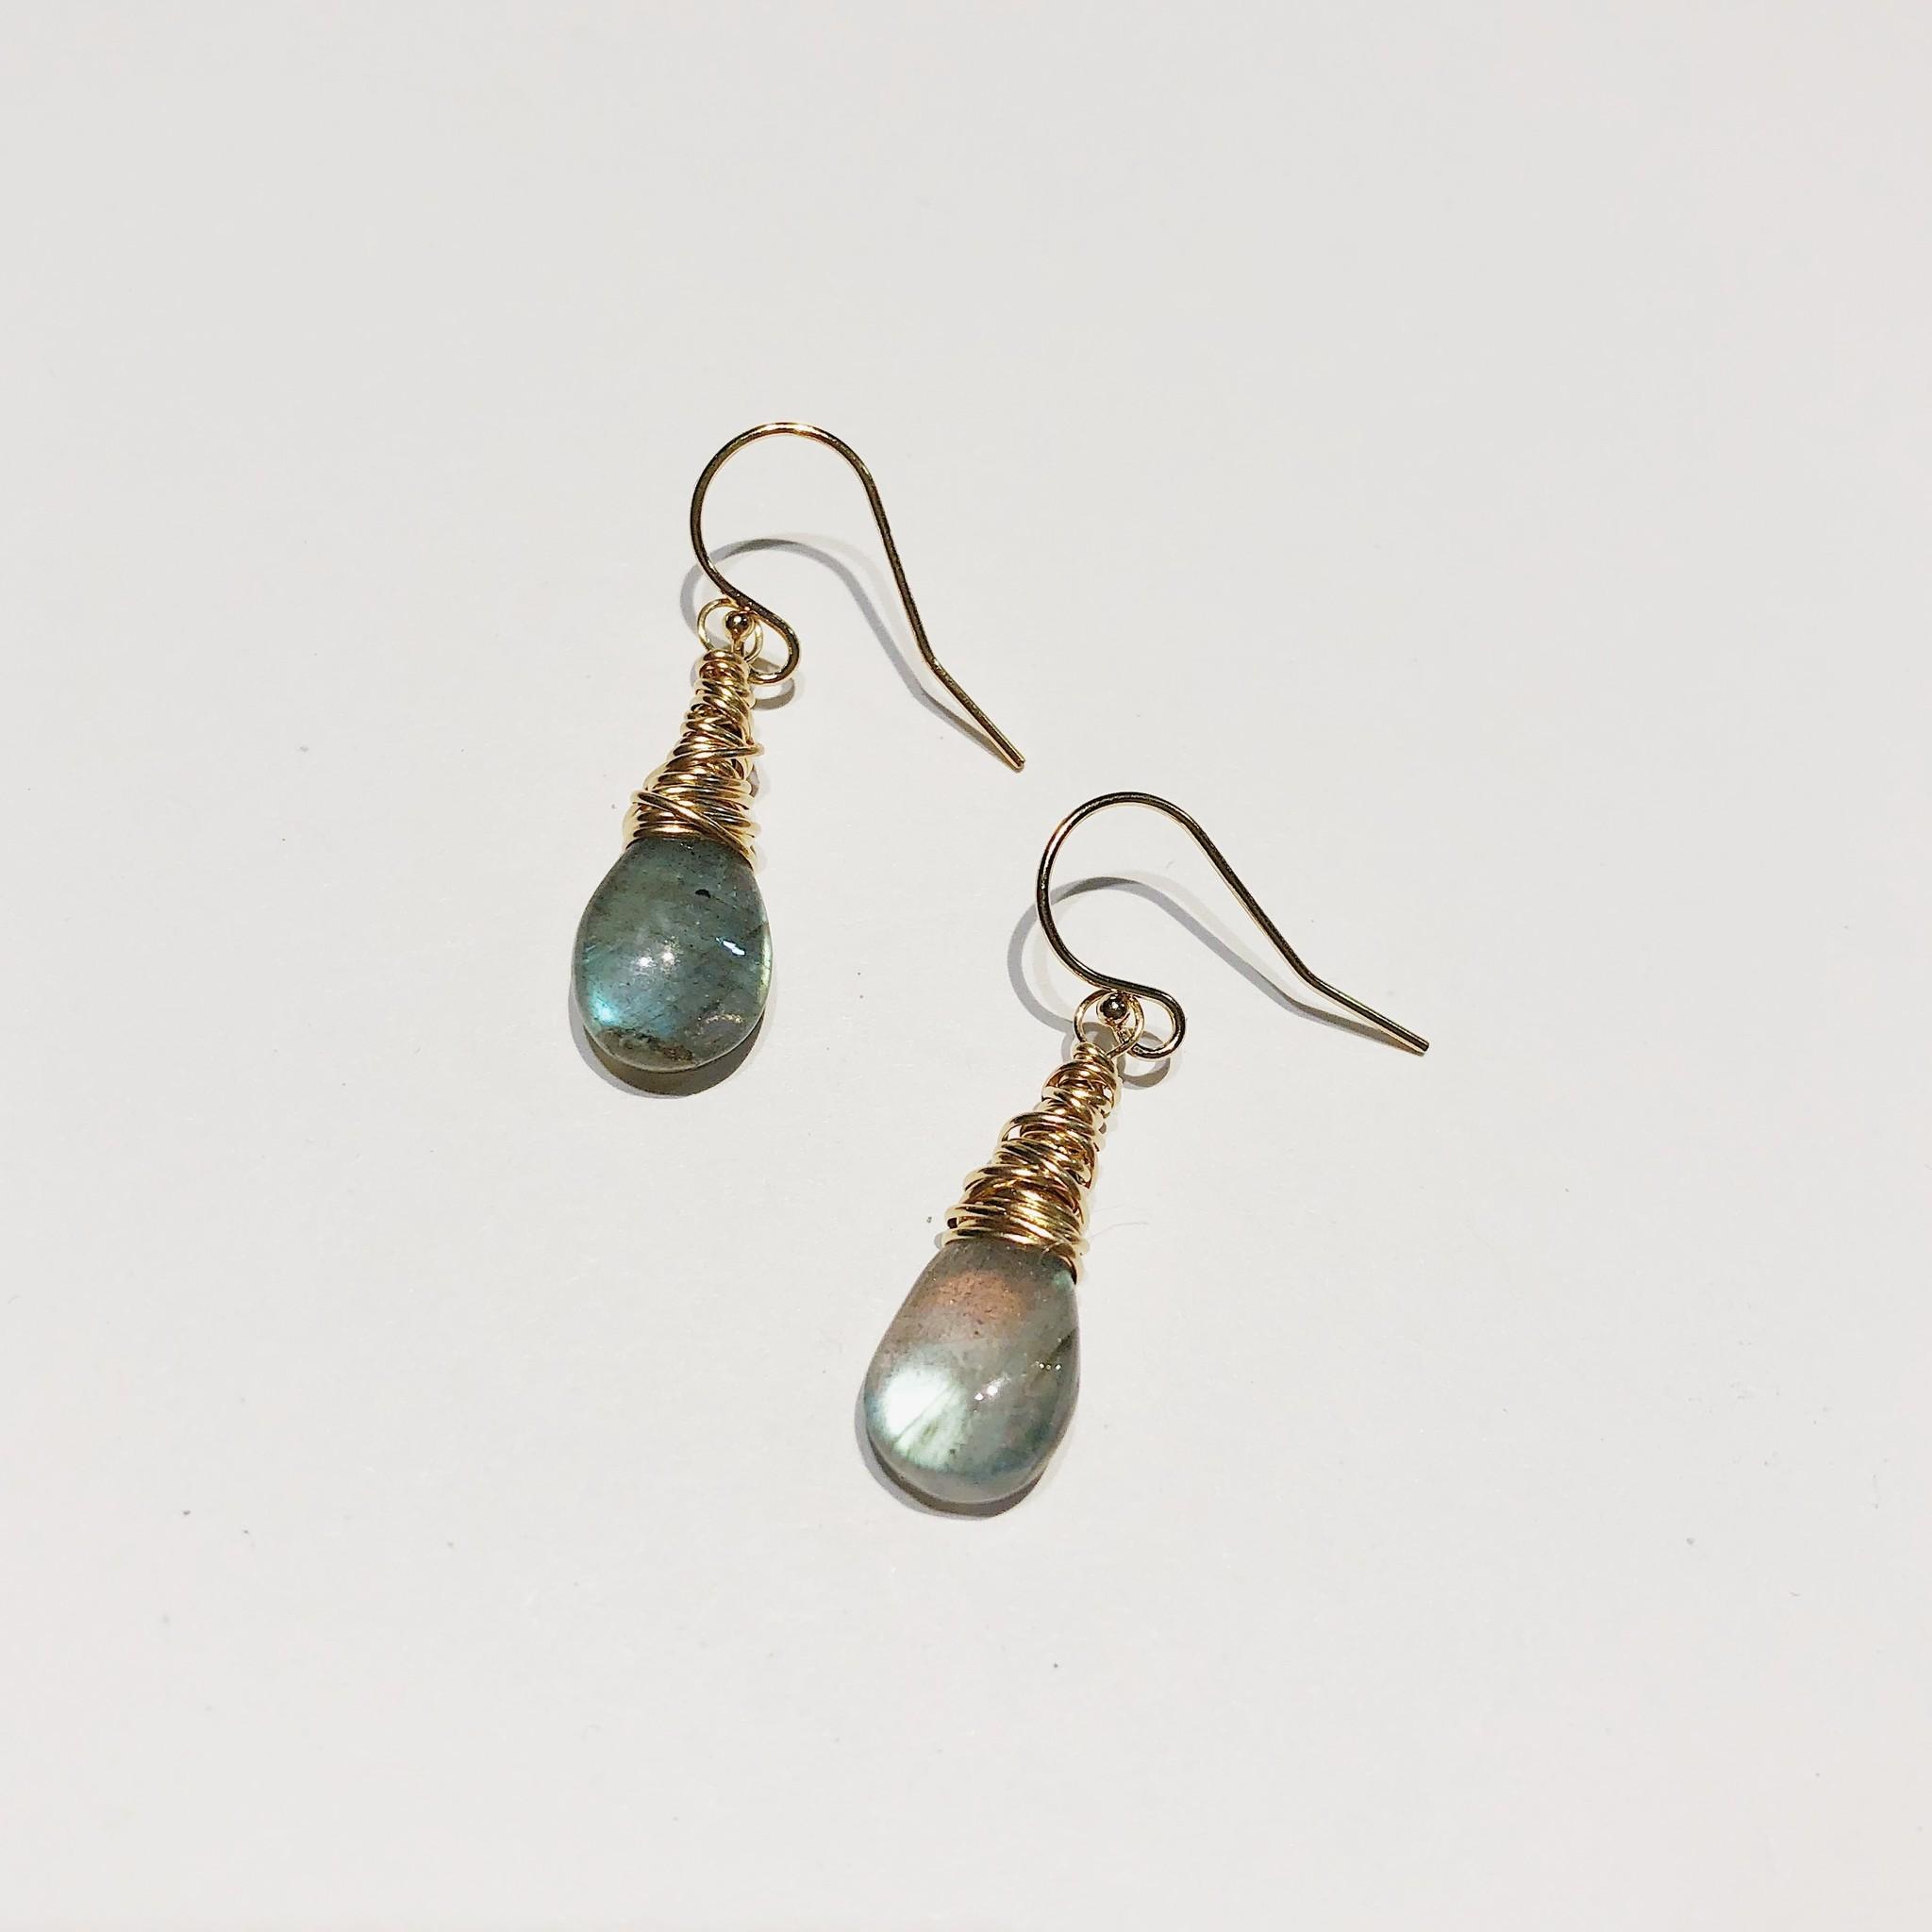 Dianne Rodger Gold Petal Earrings- Labradorite